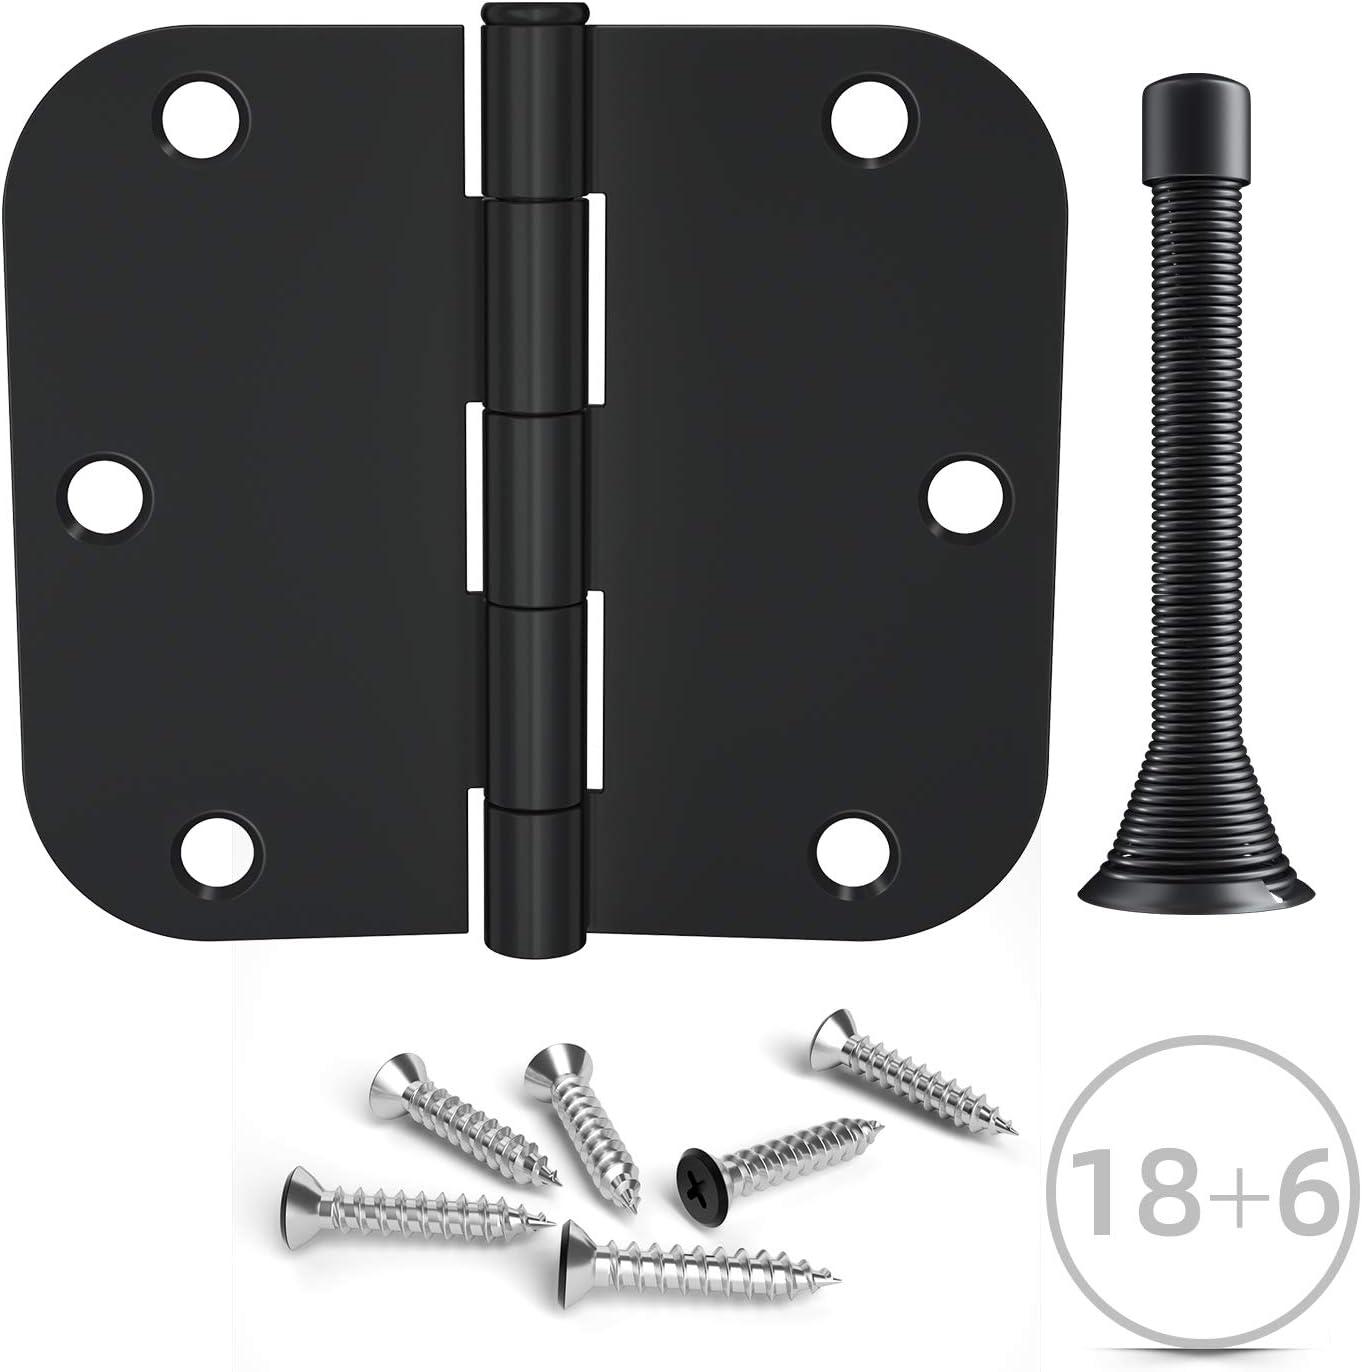 Hosom 3.5 Inches Matte Black Door Hinges, 18 Pack